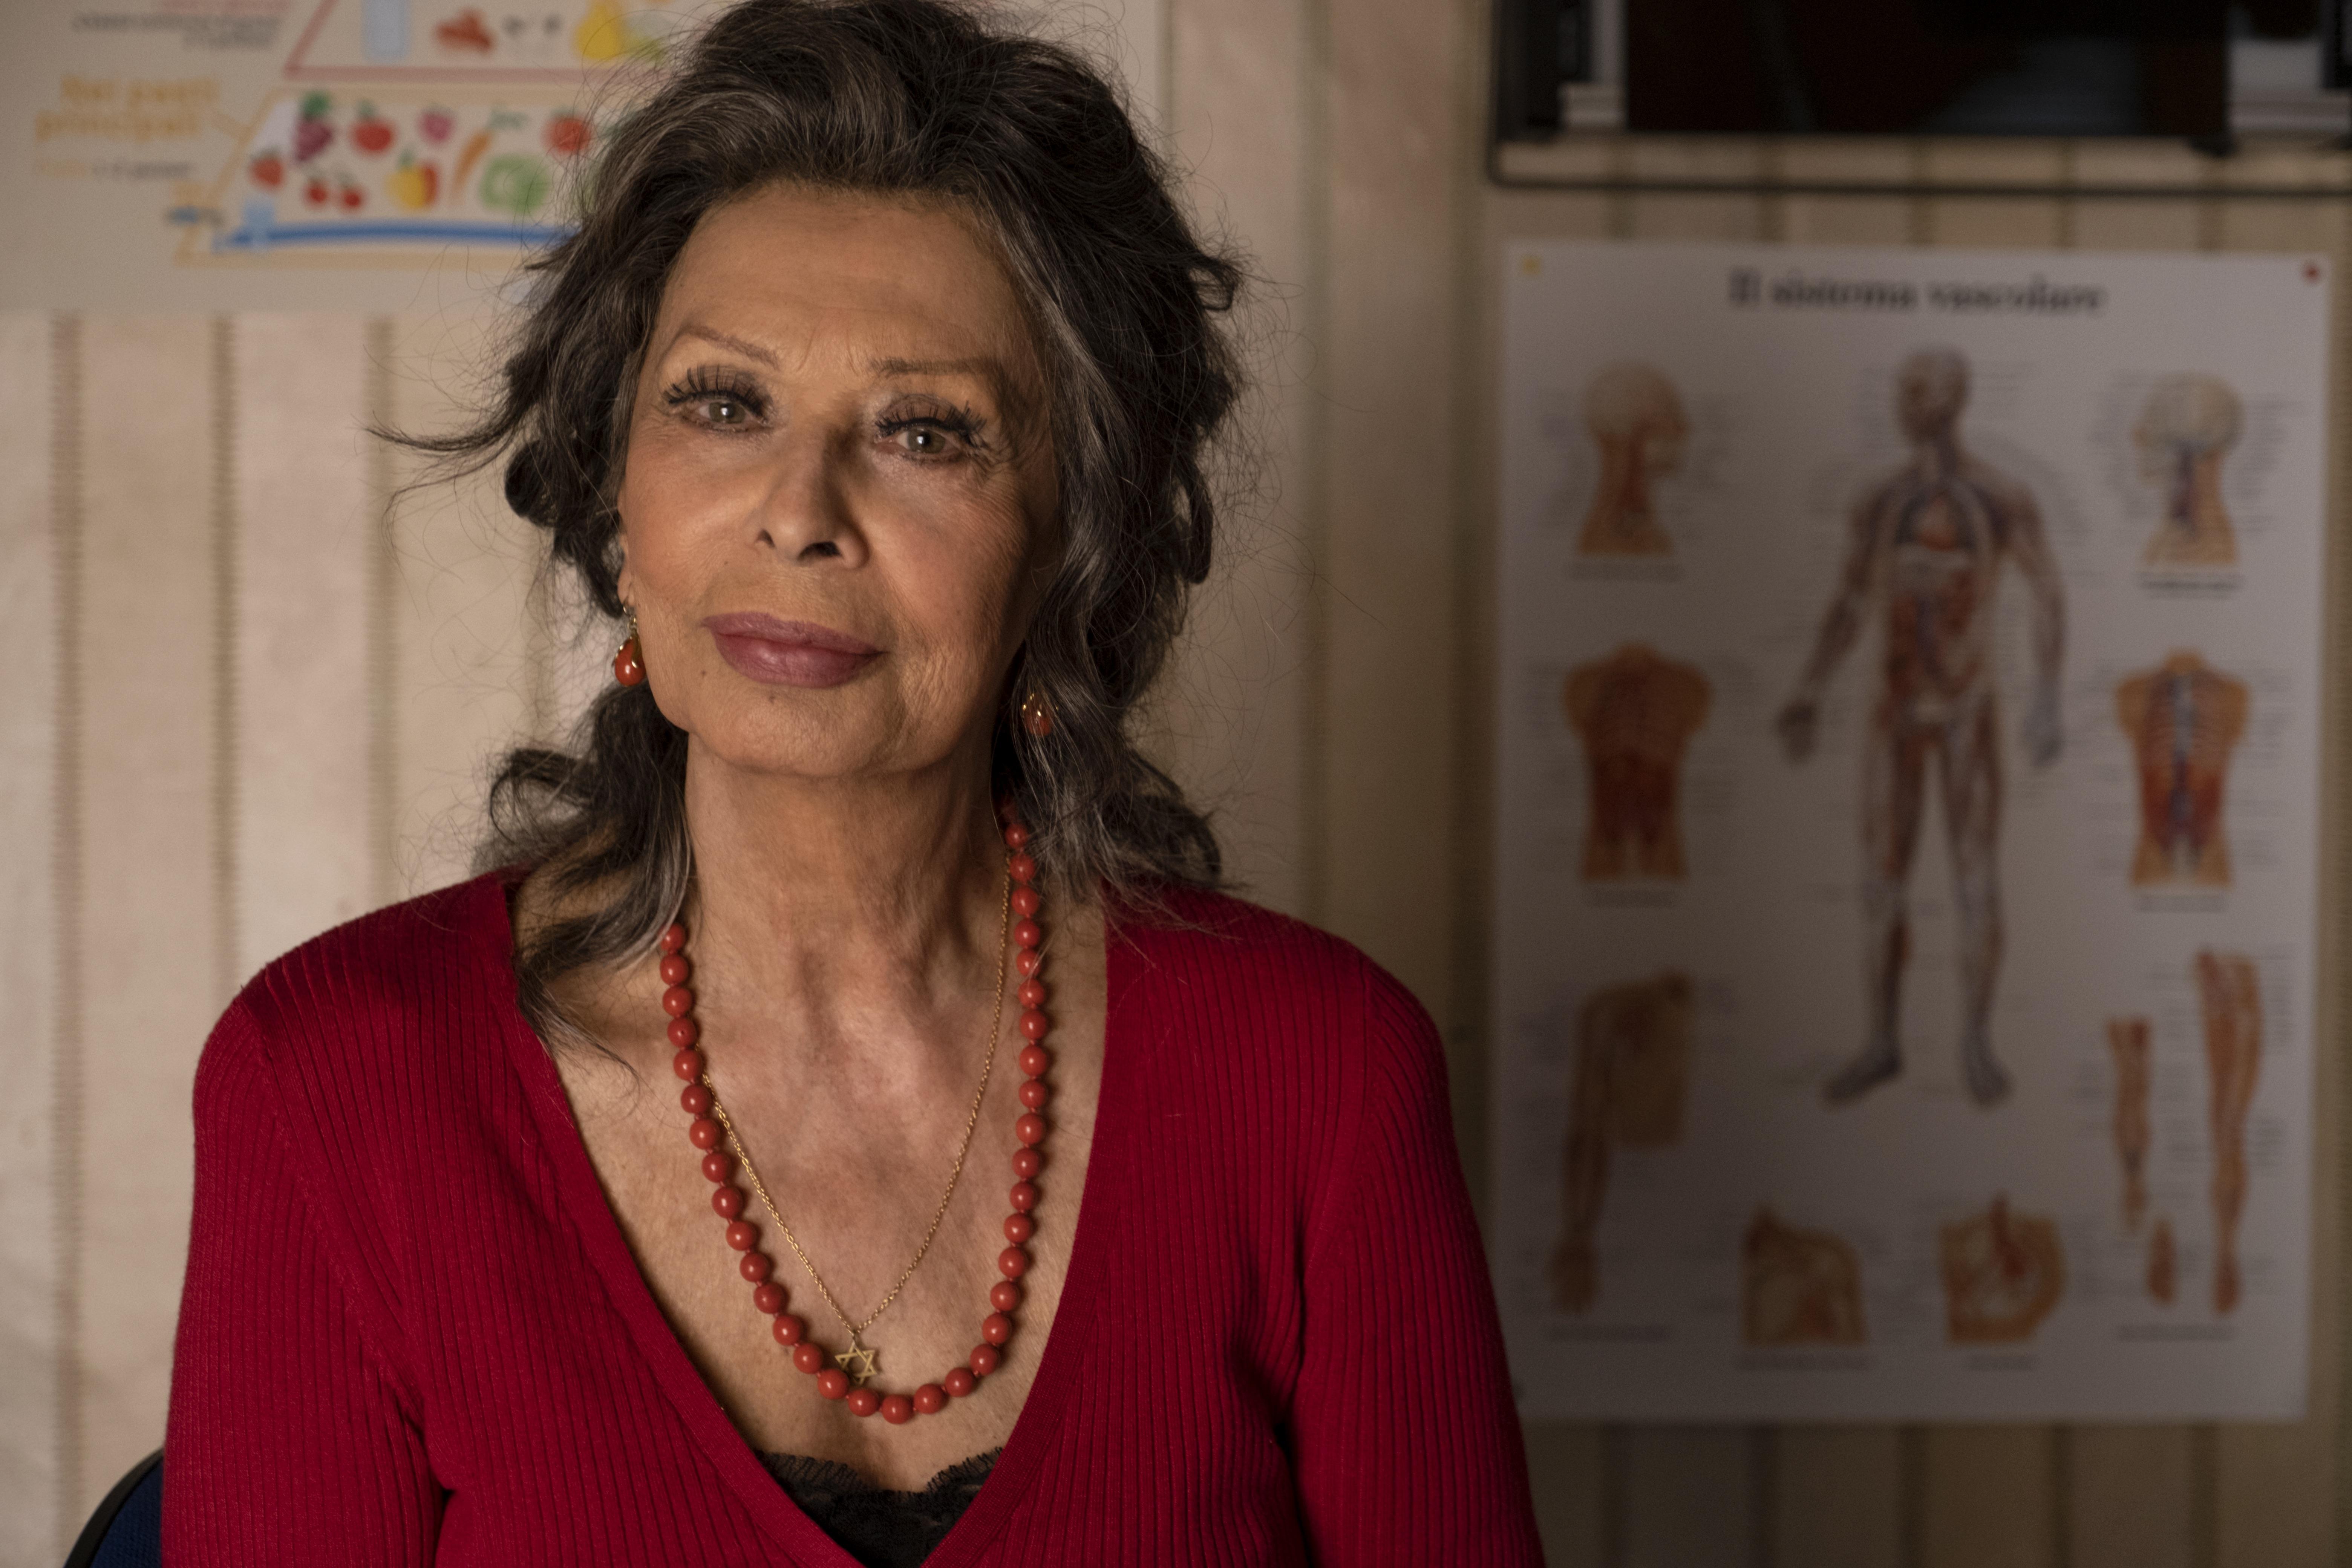 Sophia Loren in 'The Life Ahead'